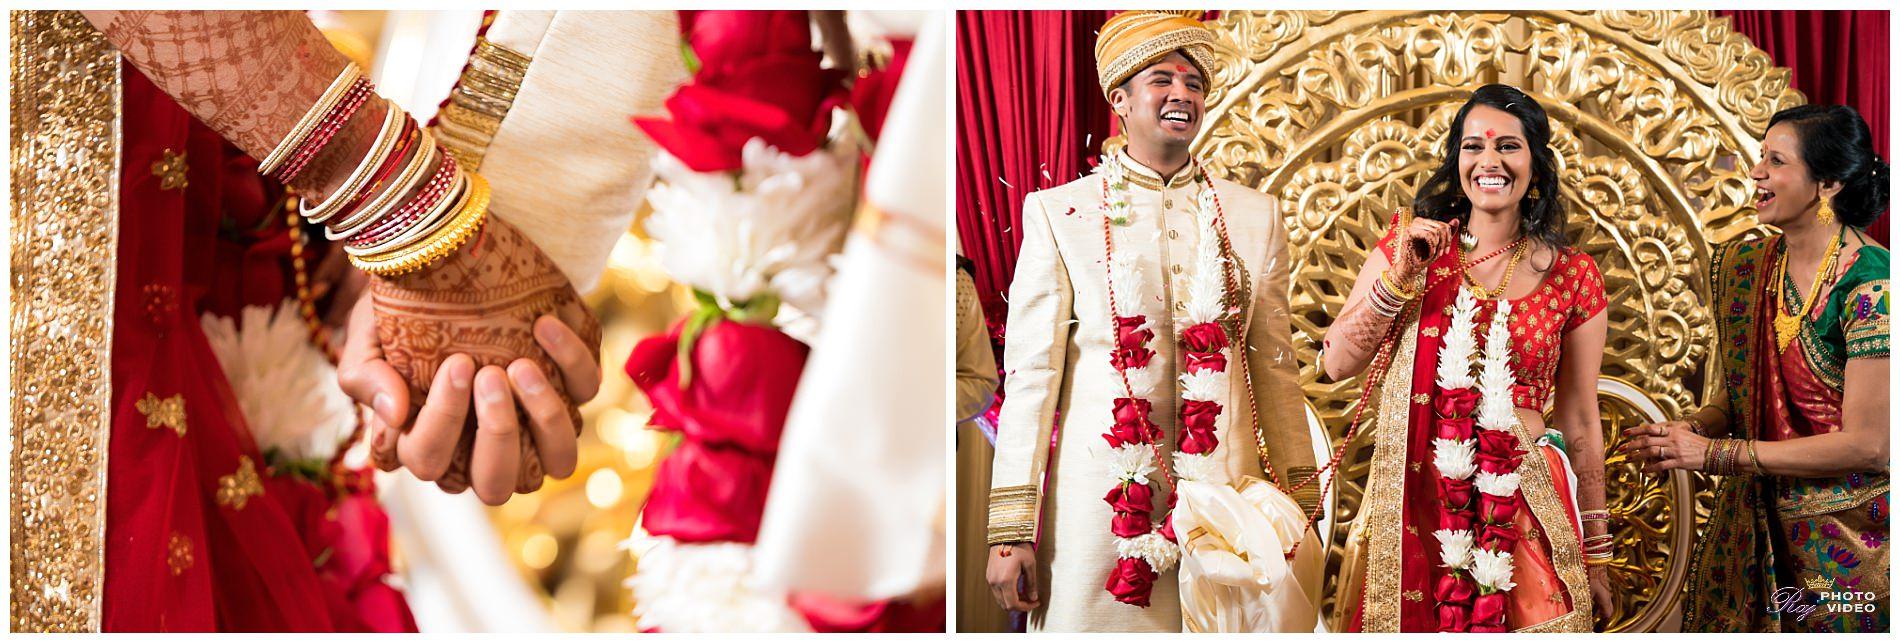 Martinsville-Gardens-NJ-Indian-Wedding-Ruchi-Vishal-31.jpg